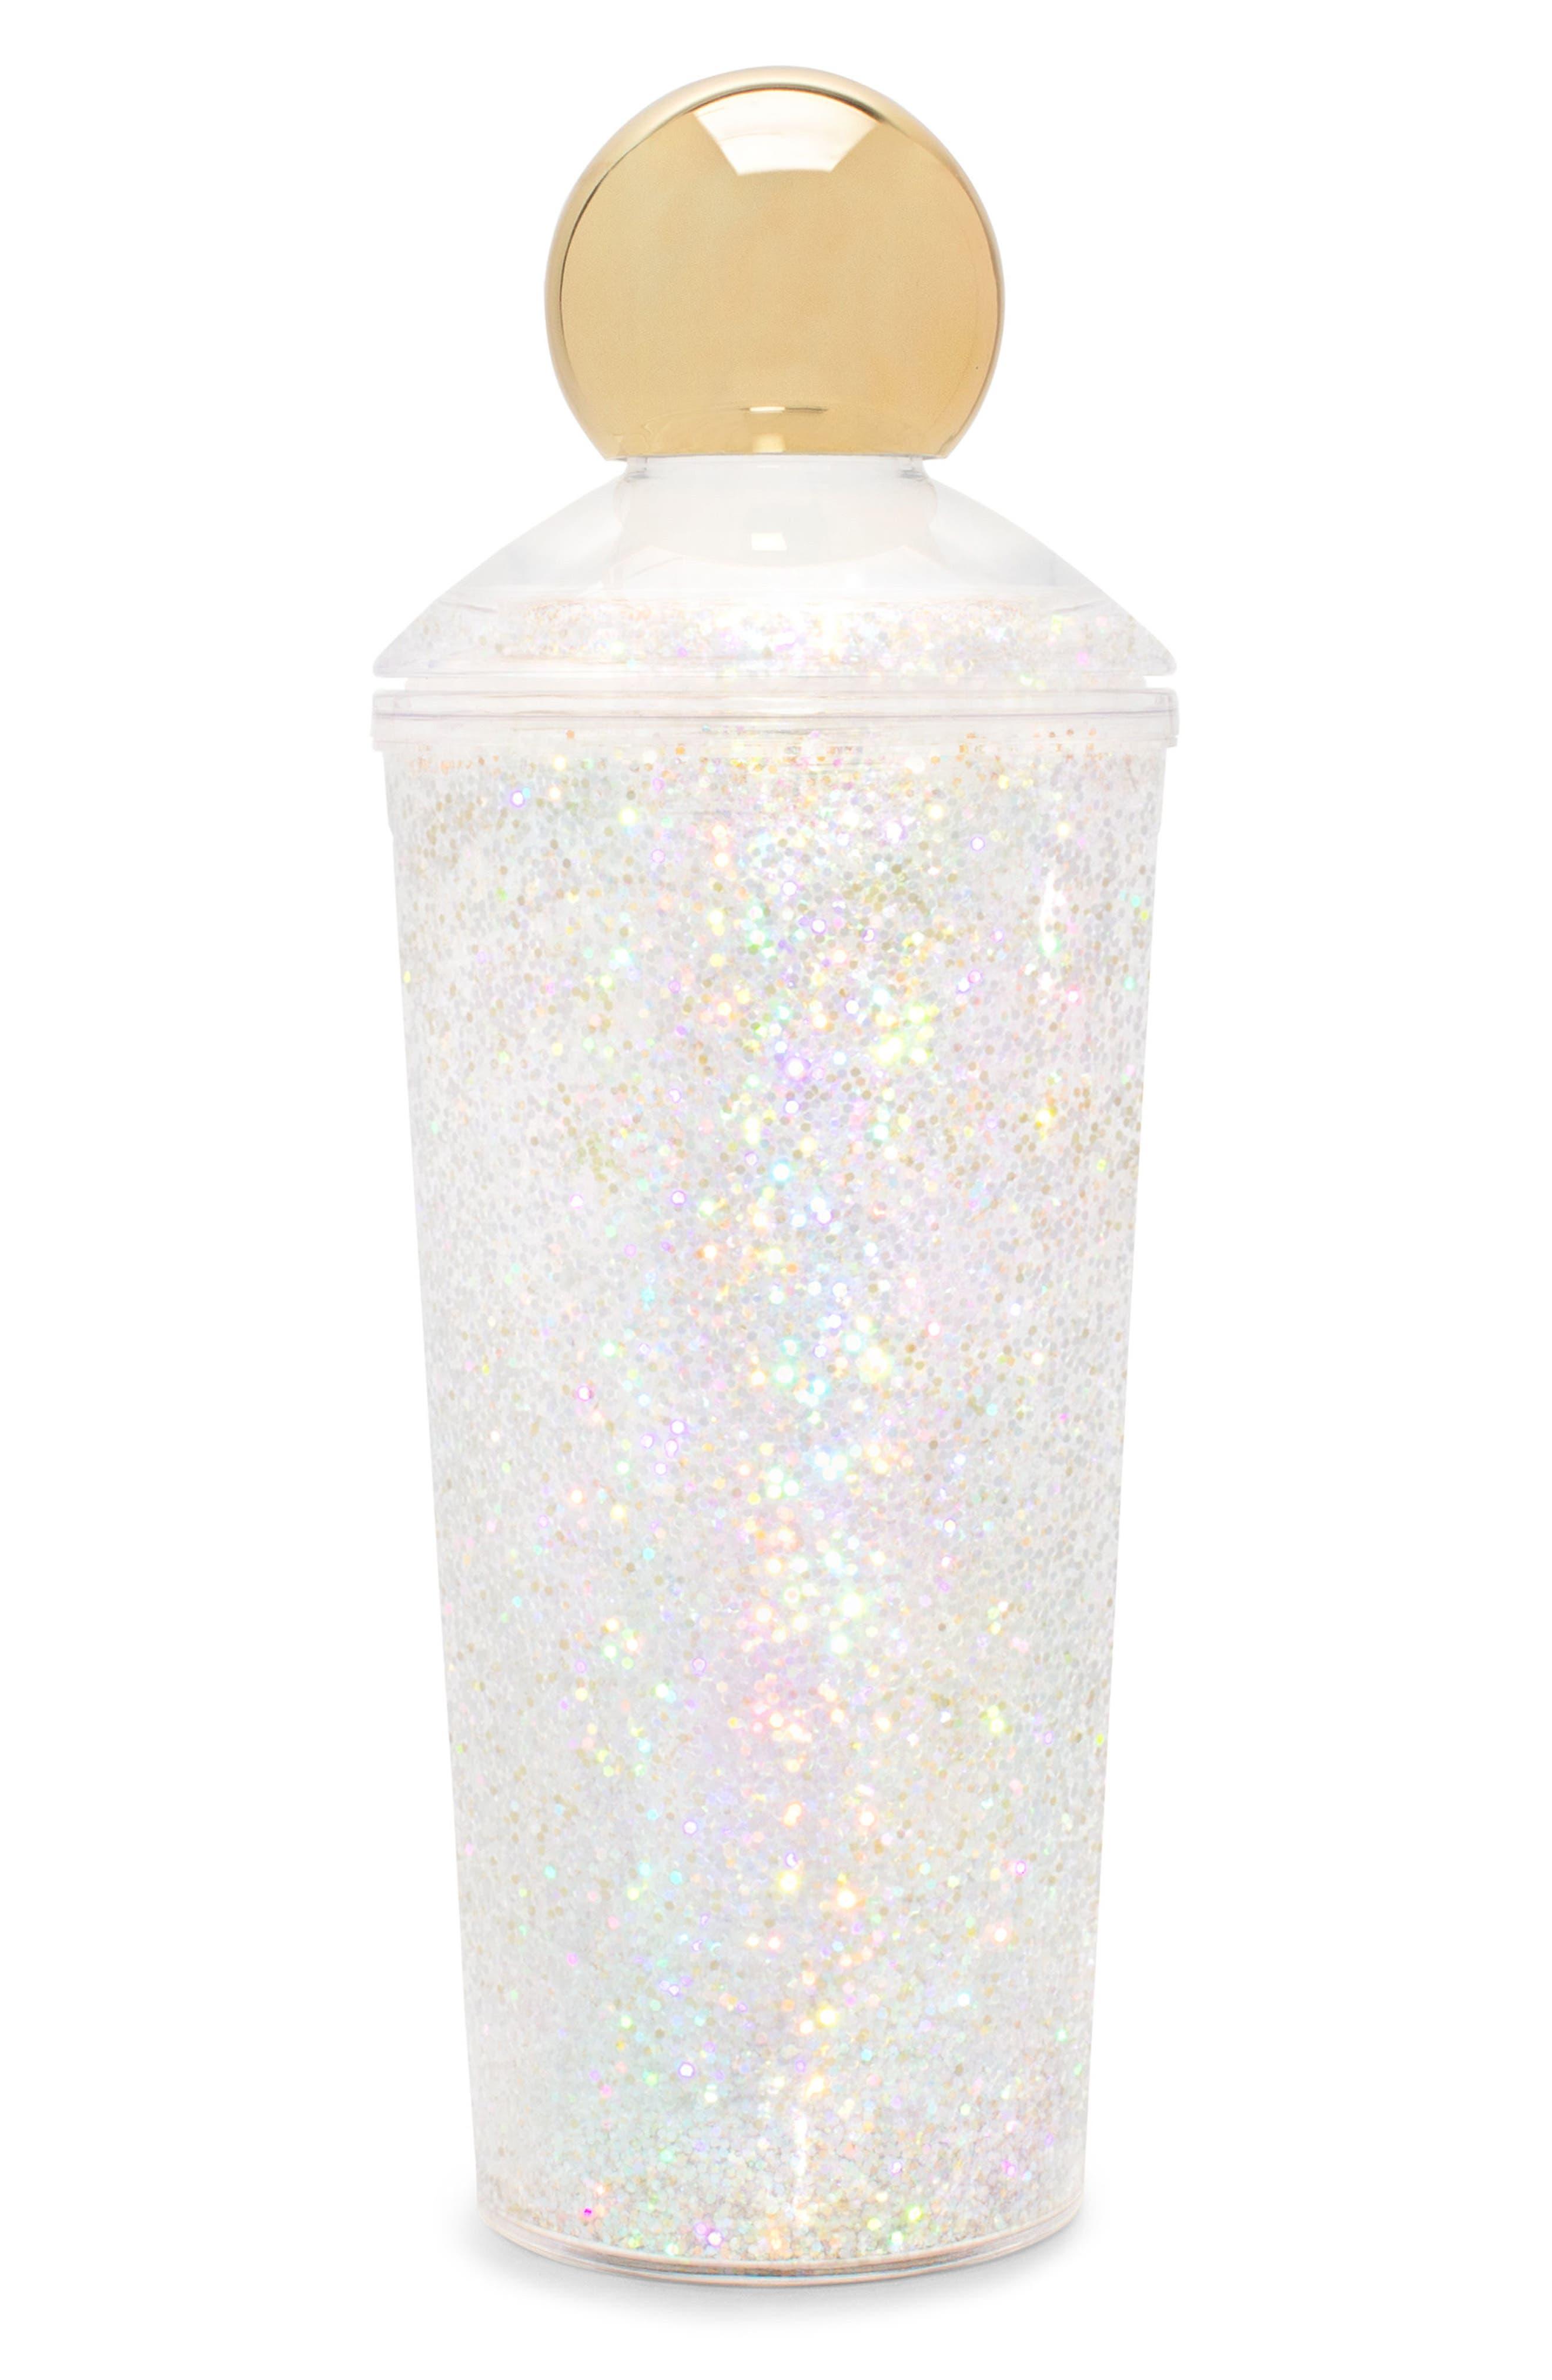 ban.do Glitter Cocktail Shaker